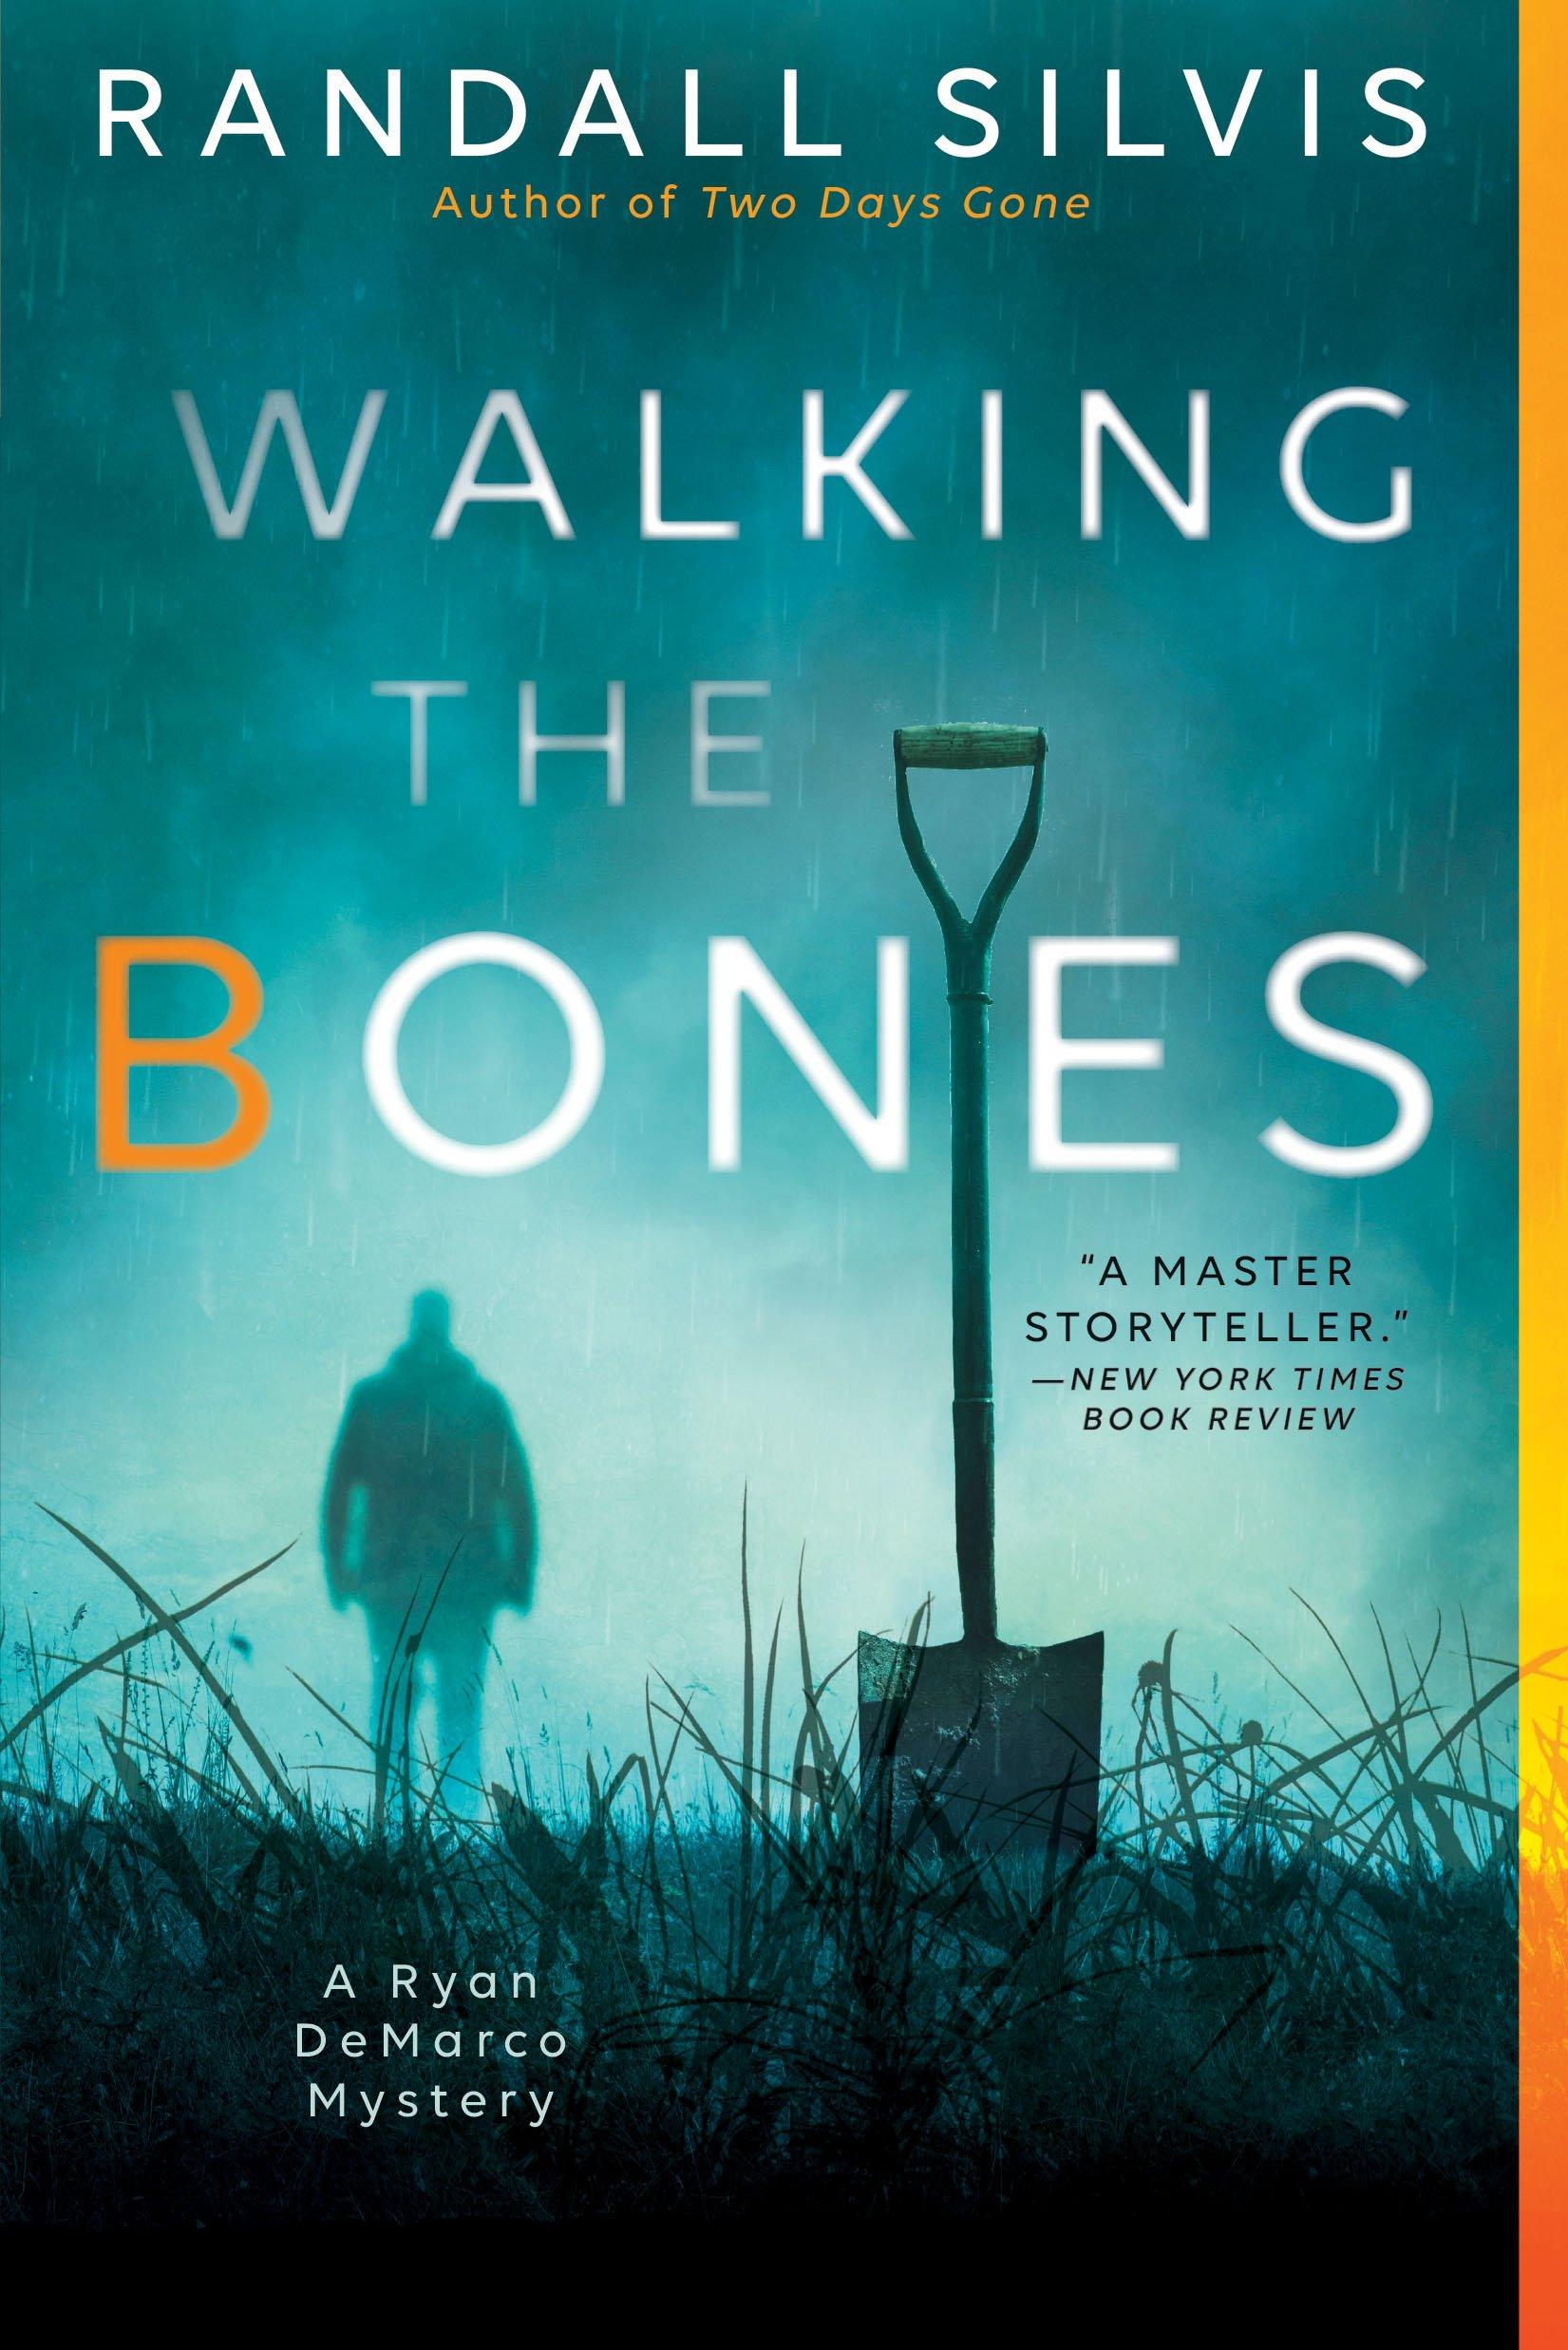 Amazon.com: Walking the Bones (Ryan DeMarco Mystery) (9781492646914 ...